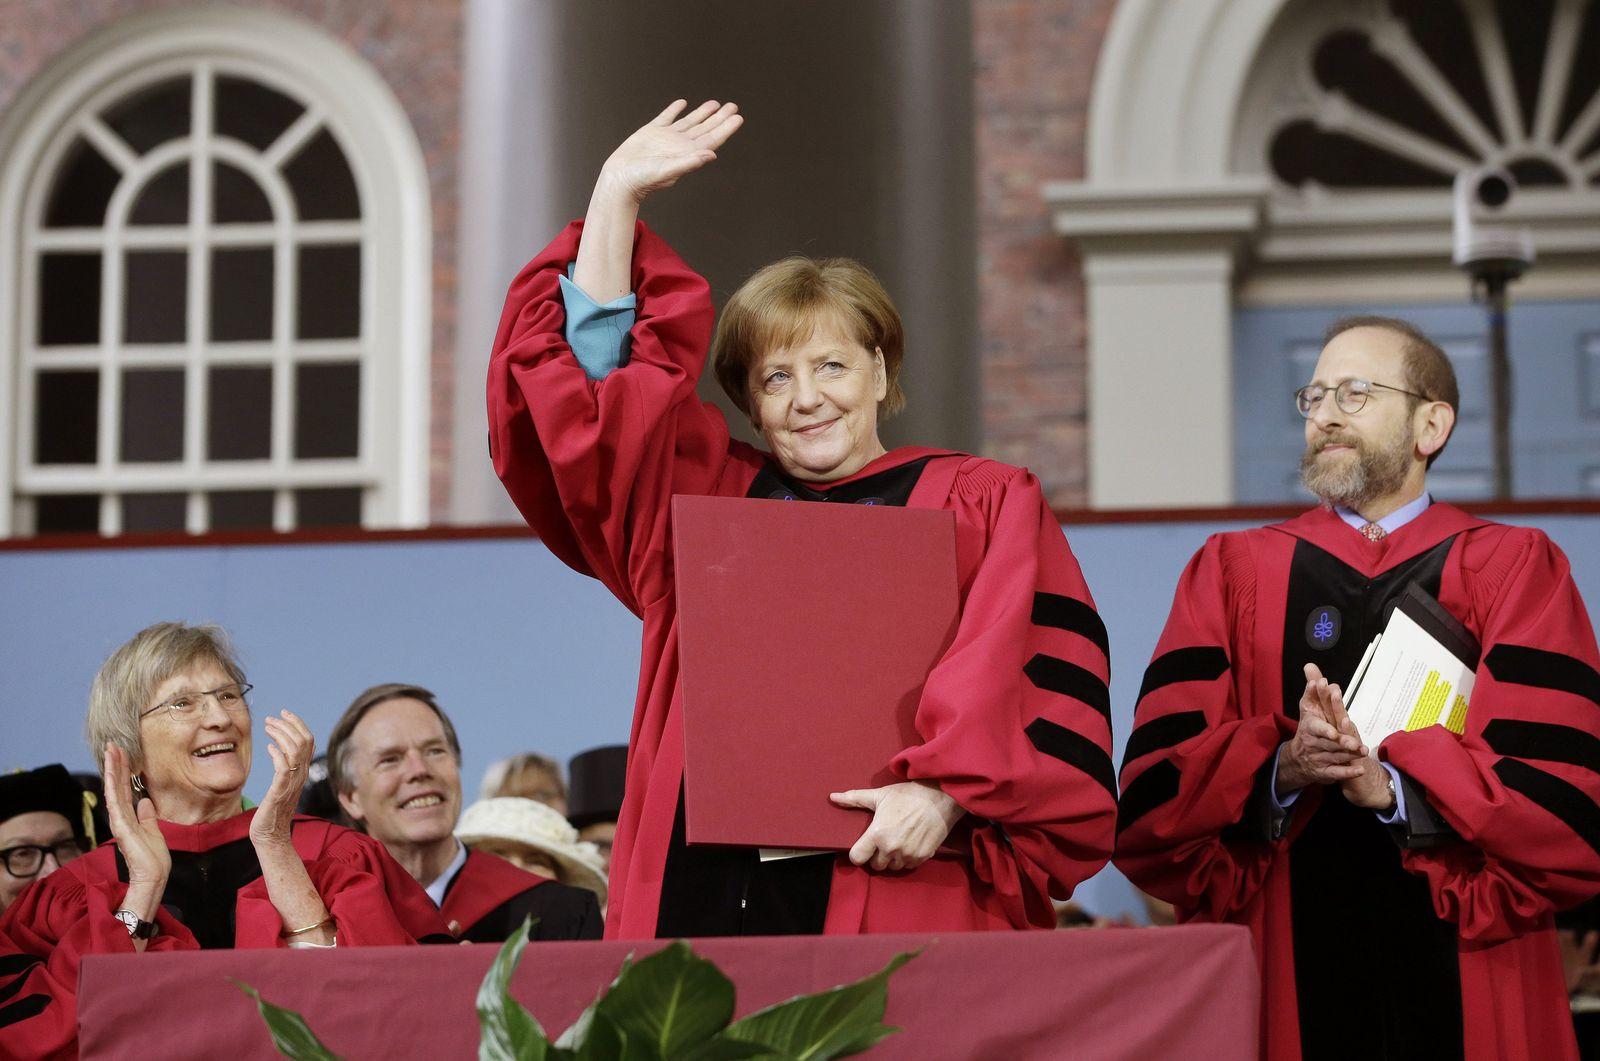 Harvard Commencement Merkel